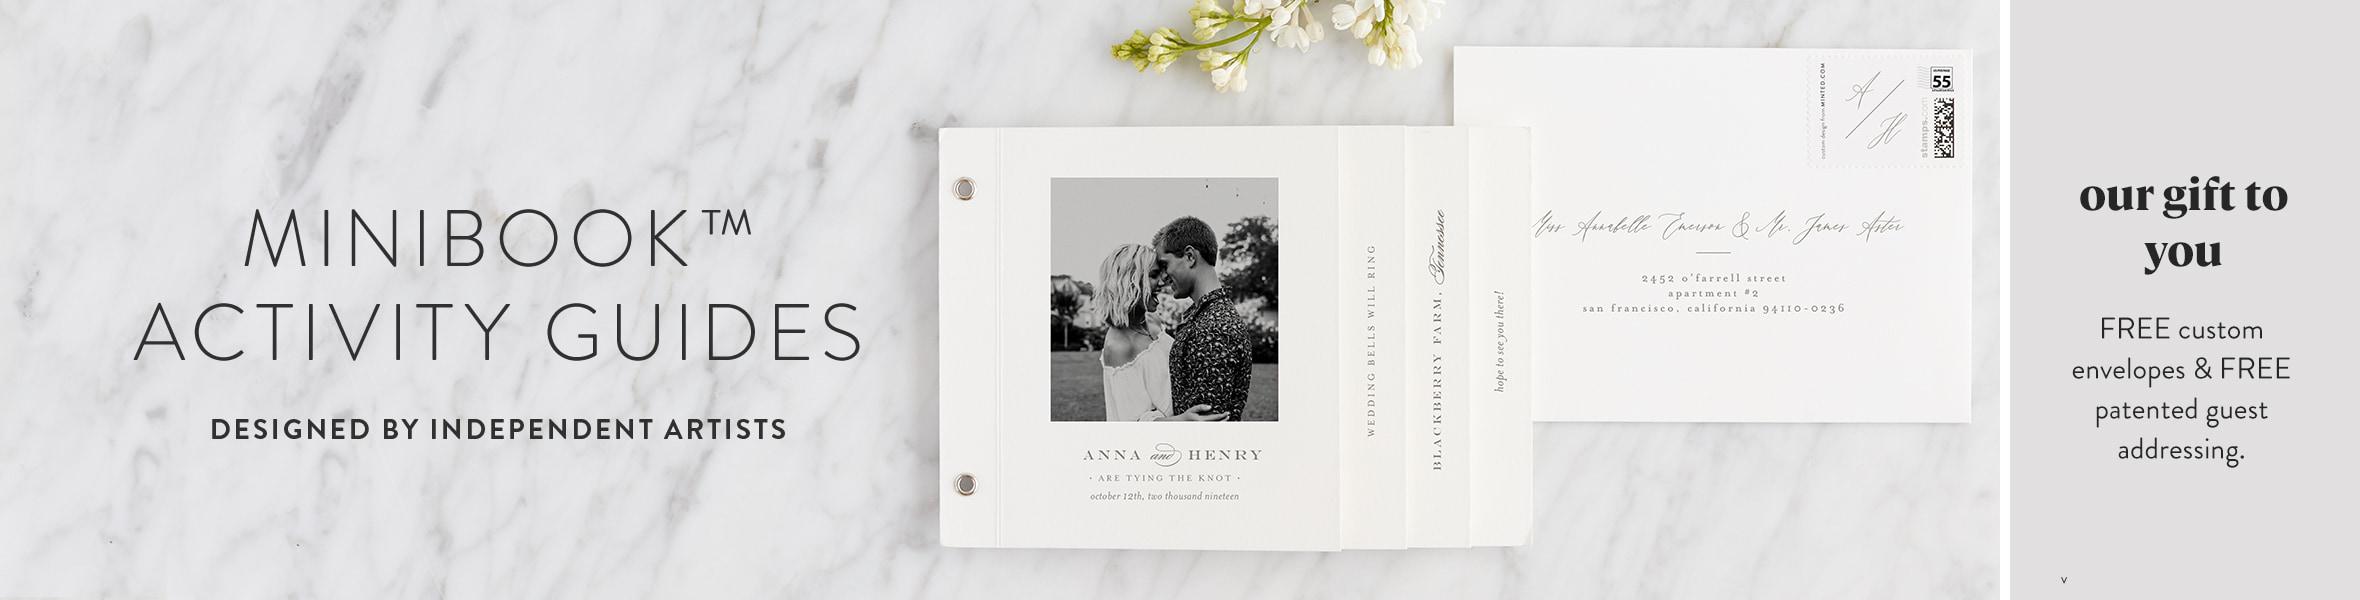 Wedding Invitation Minibook Cards